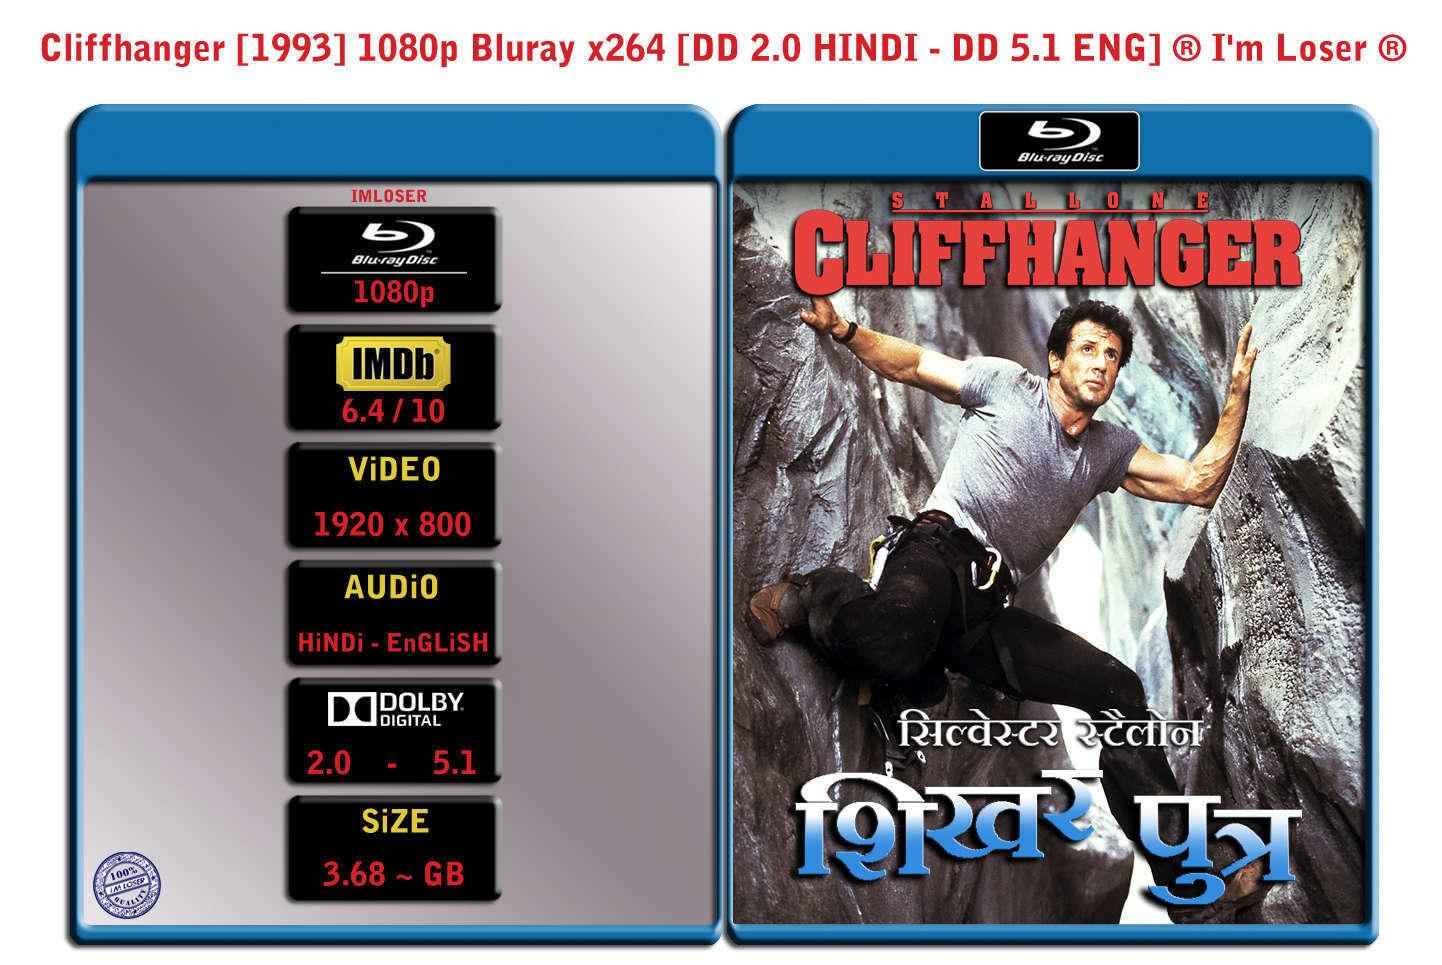 Cliffhanger [1993] 1080p BluRay x264 [DD 2 0 HINDI - DD 5 1 ENG] ® I'm Loser ®